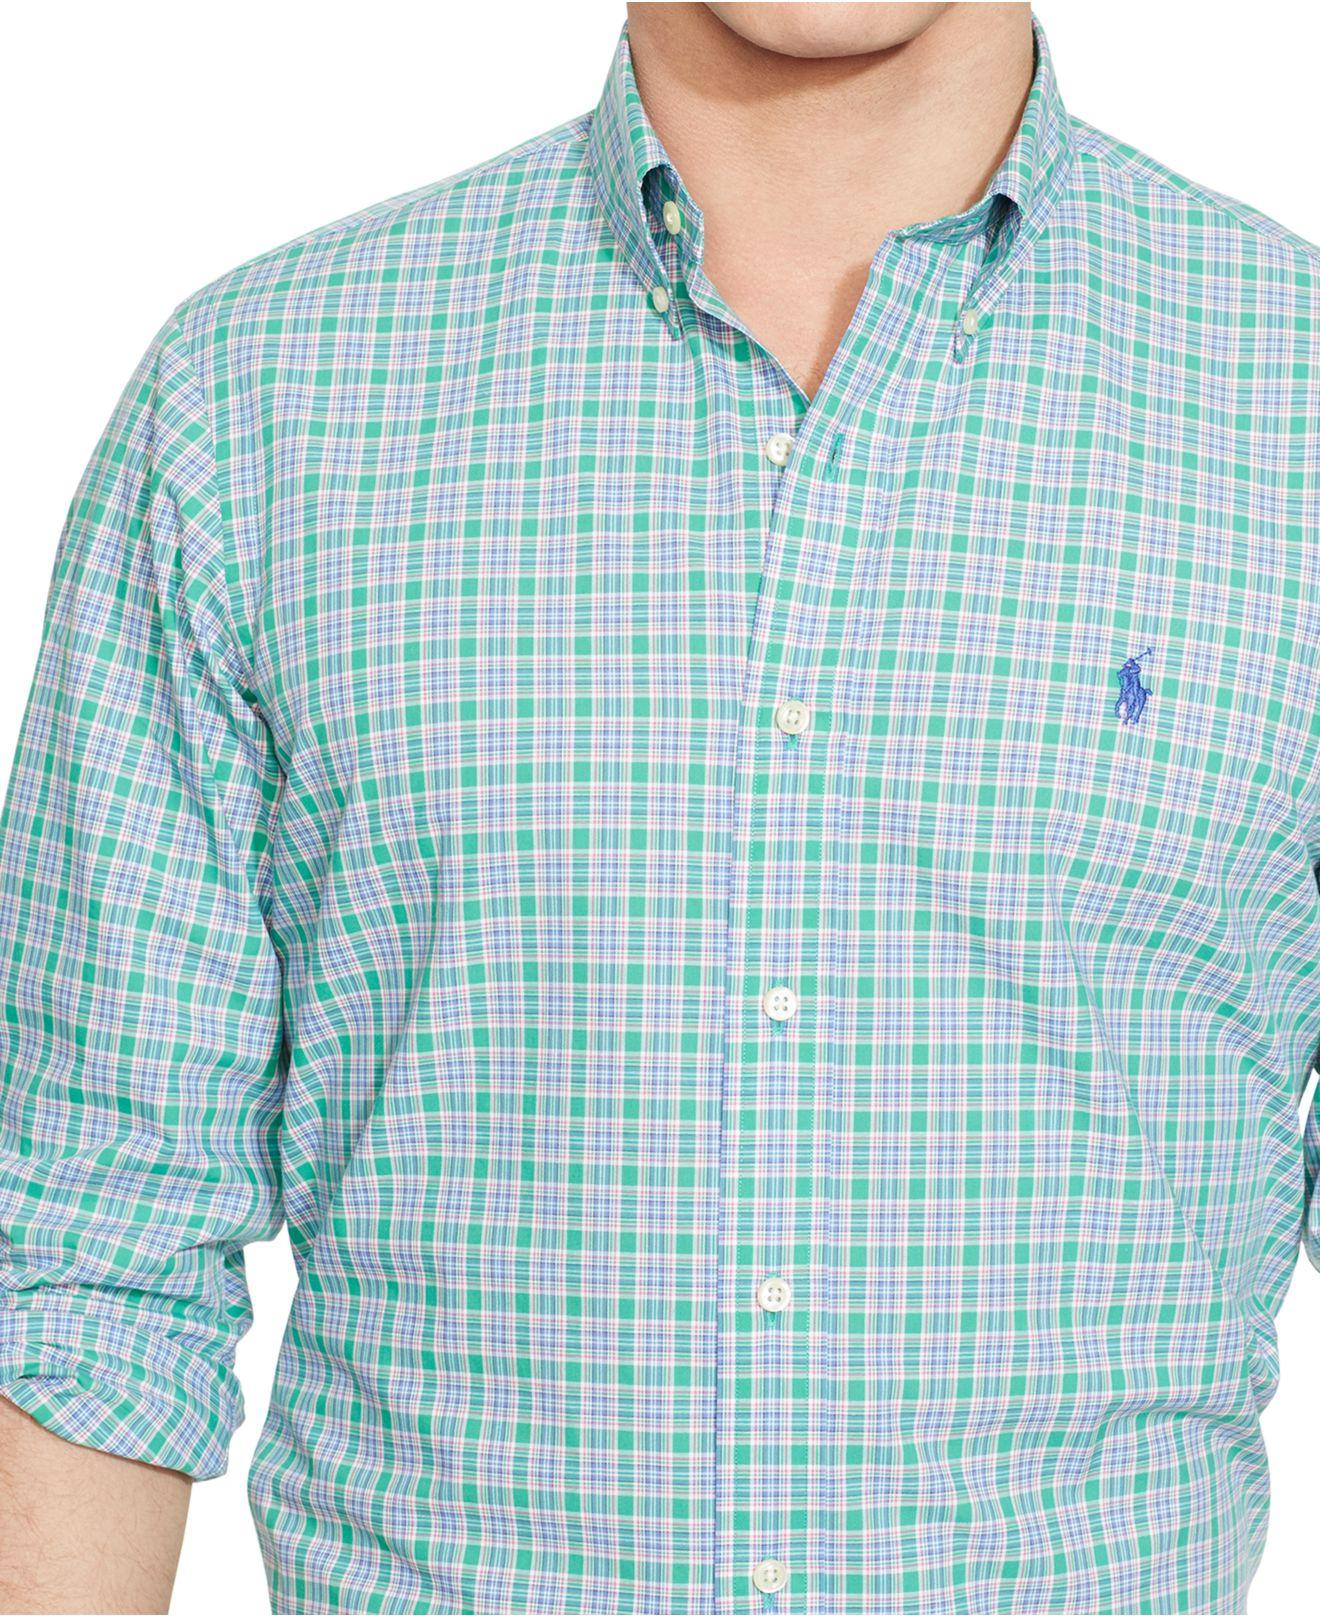 Polo Ralph Lauren Plaid Poplin Shirt In Green For Men Lyst